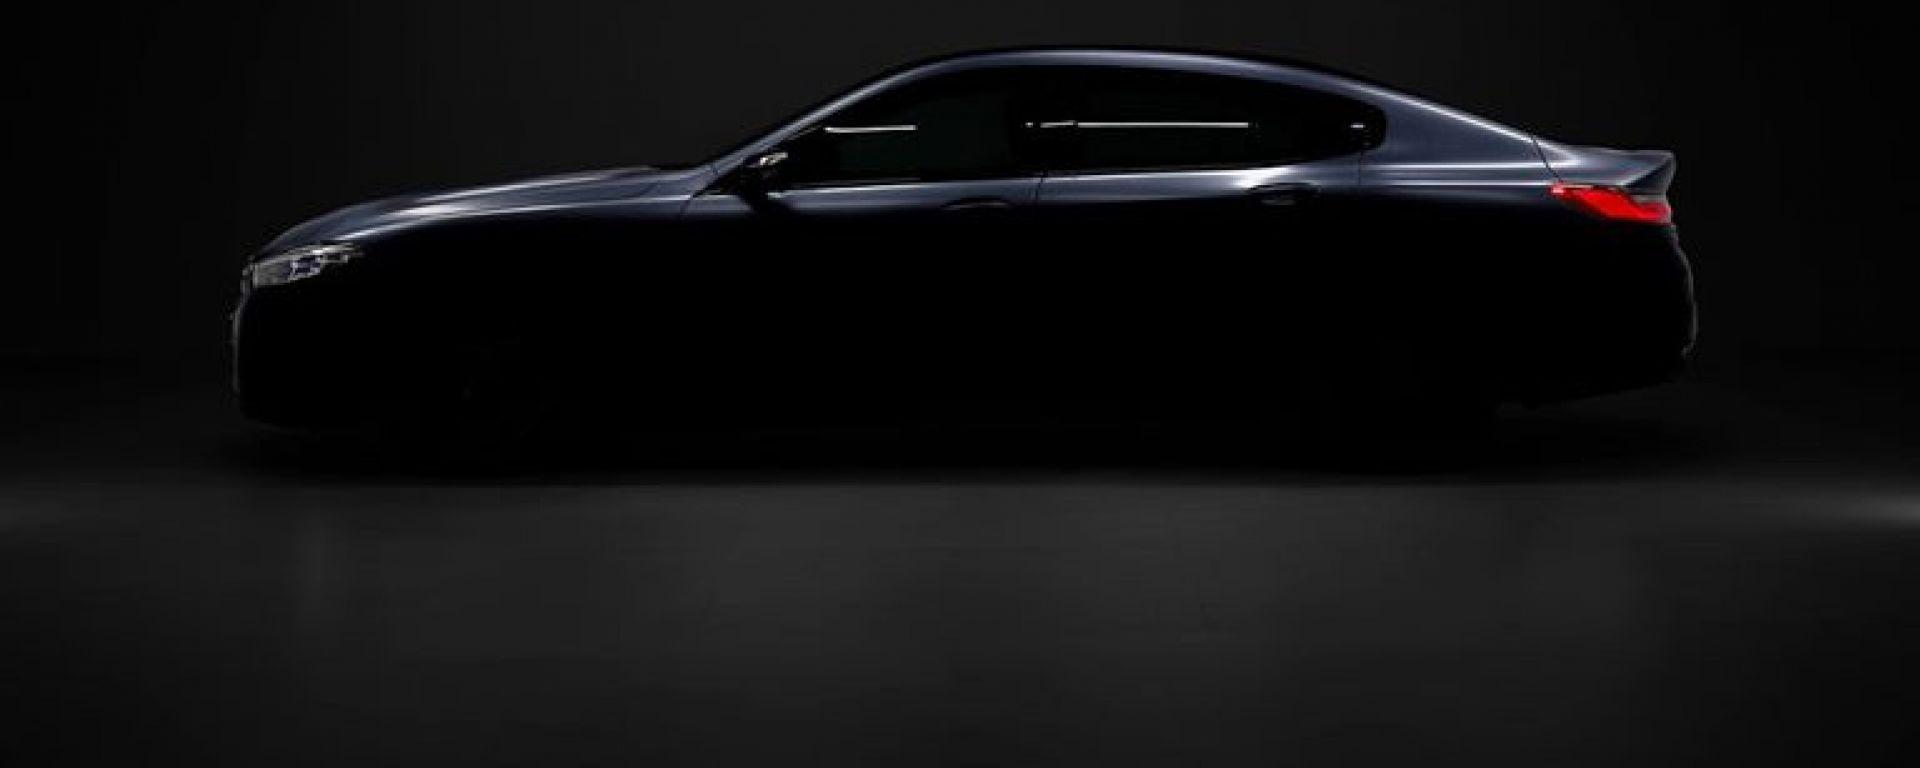 BMW Serie 8 Gran Coupé, la silhouette